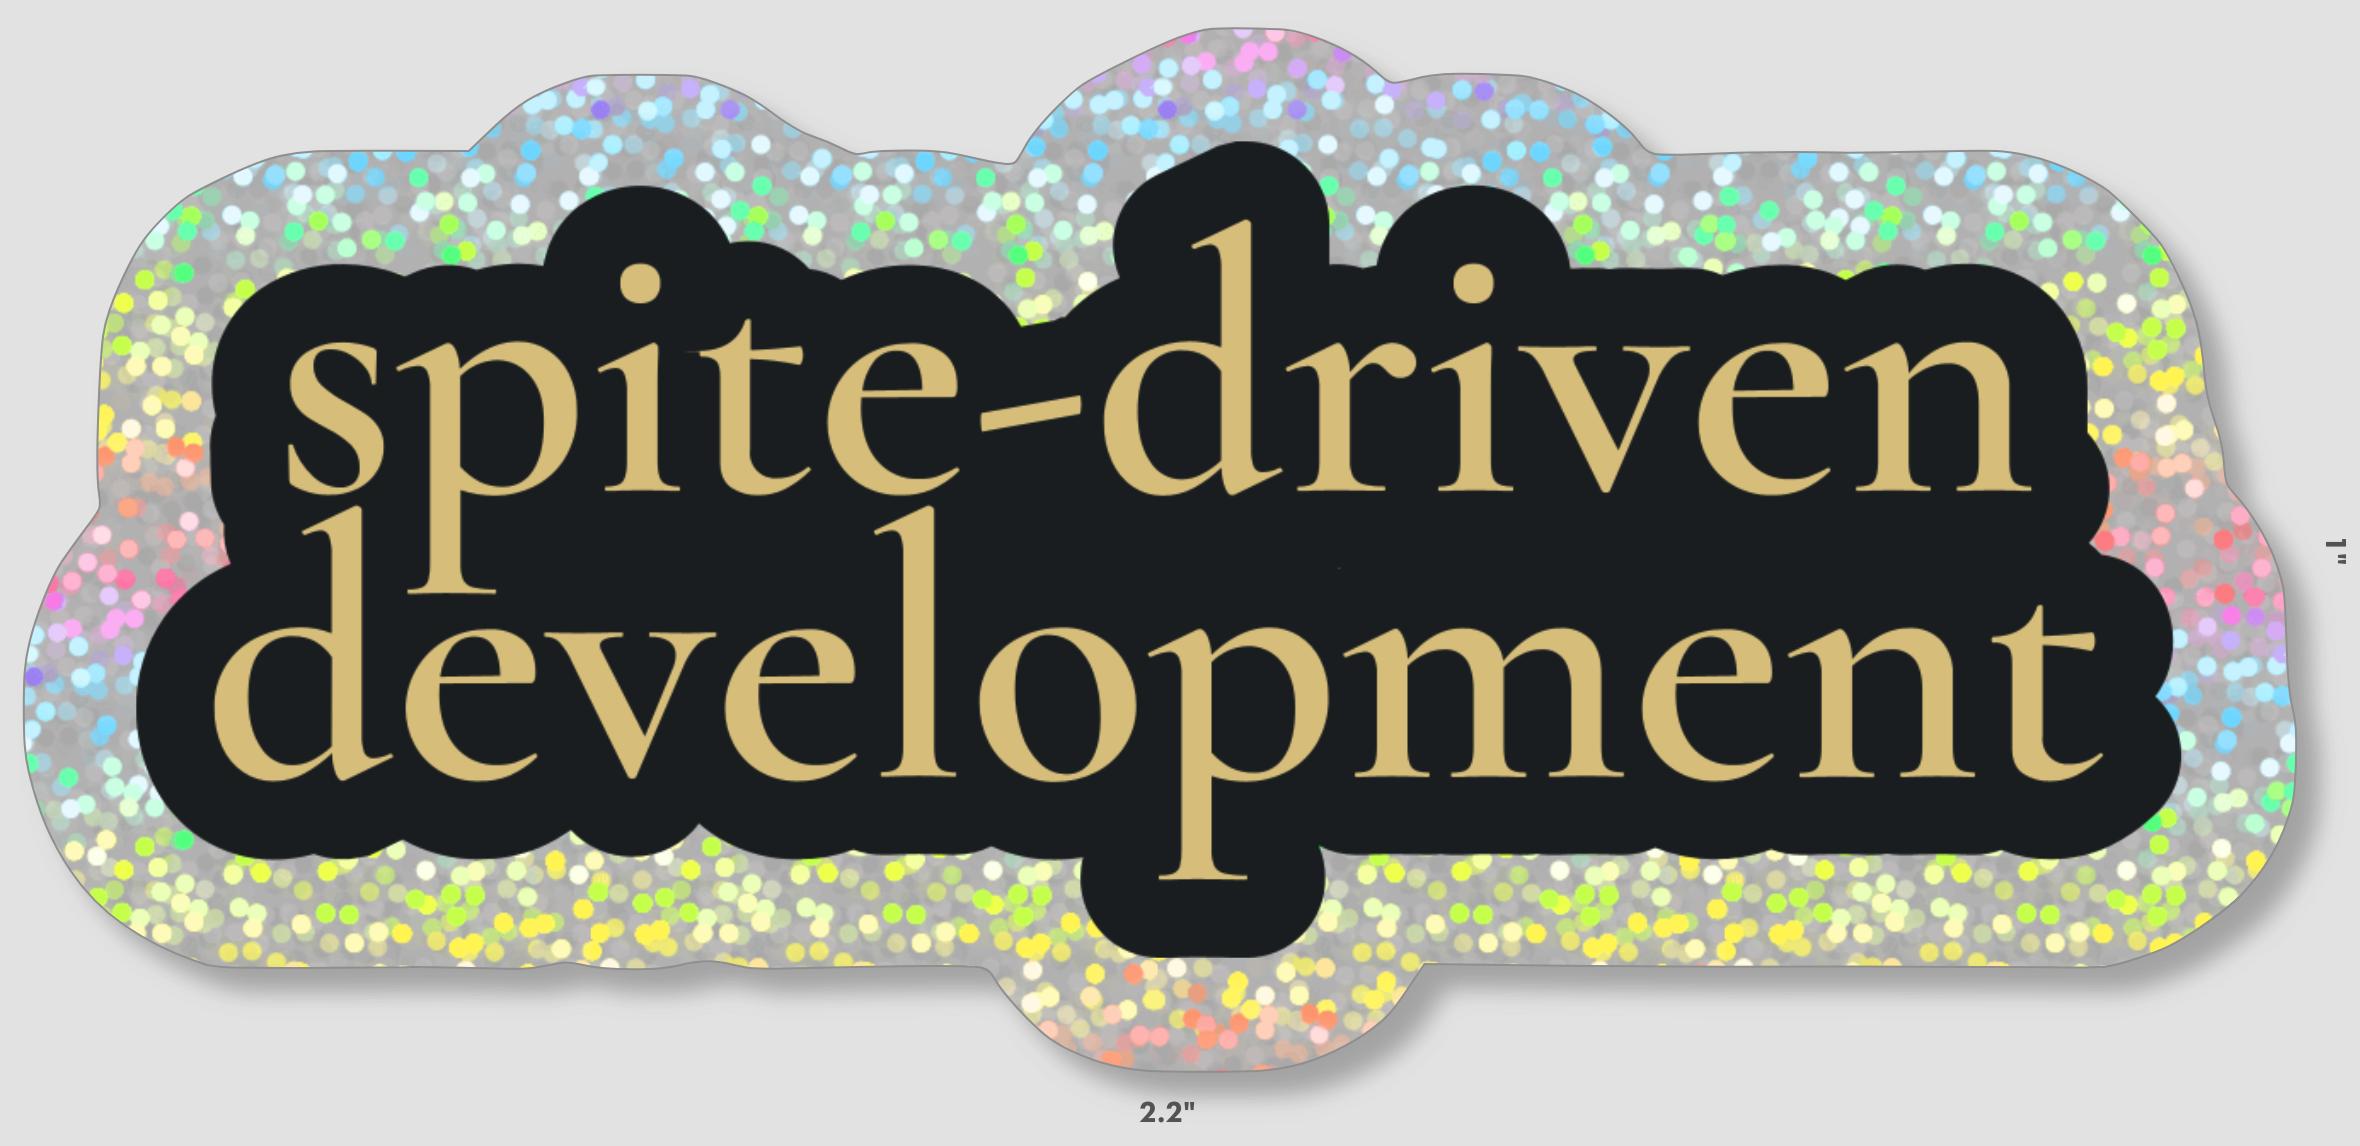 spite-driven development in gold serif font on black outline with larger sparkly outline